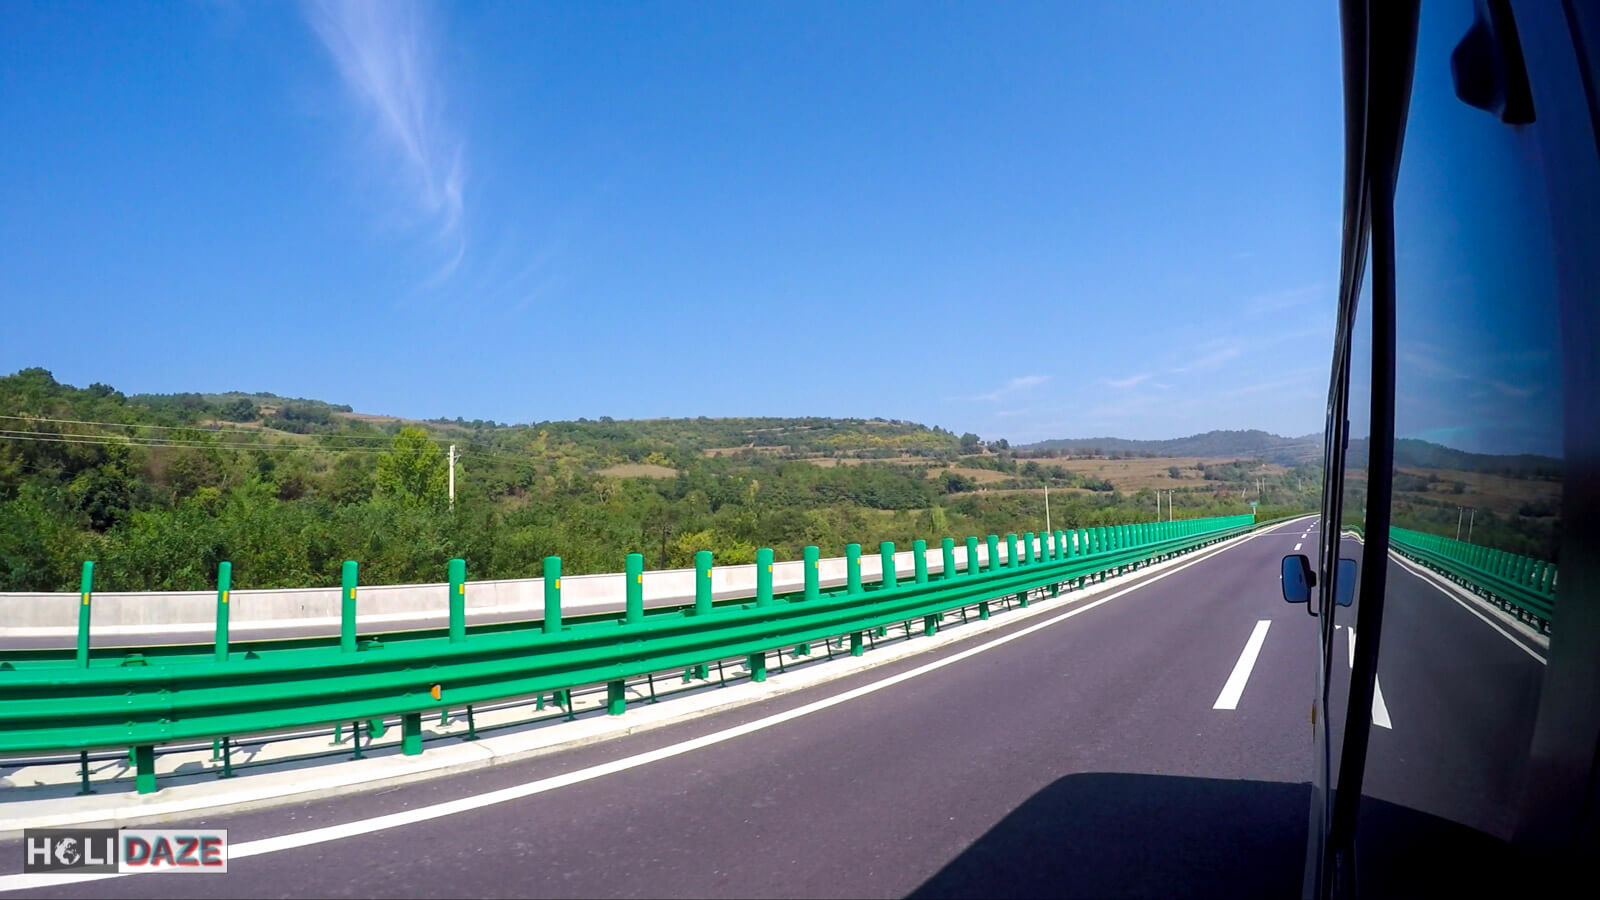 Enjoying some pristine blue skies while road-tripping around China